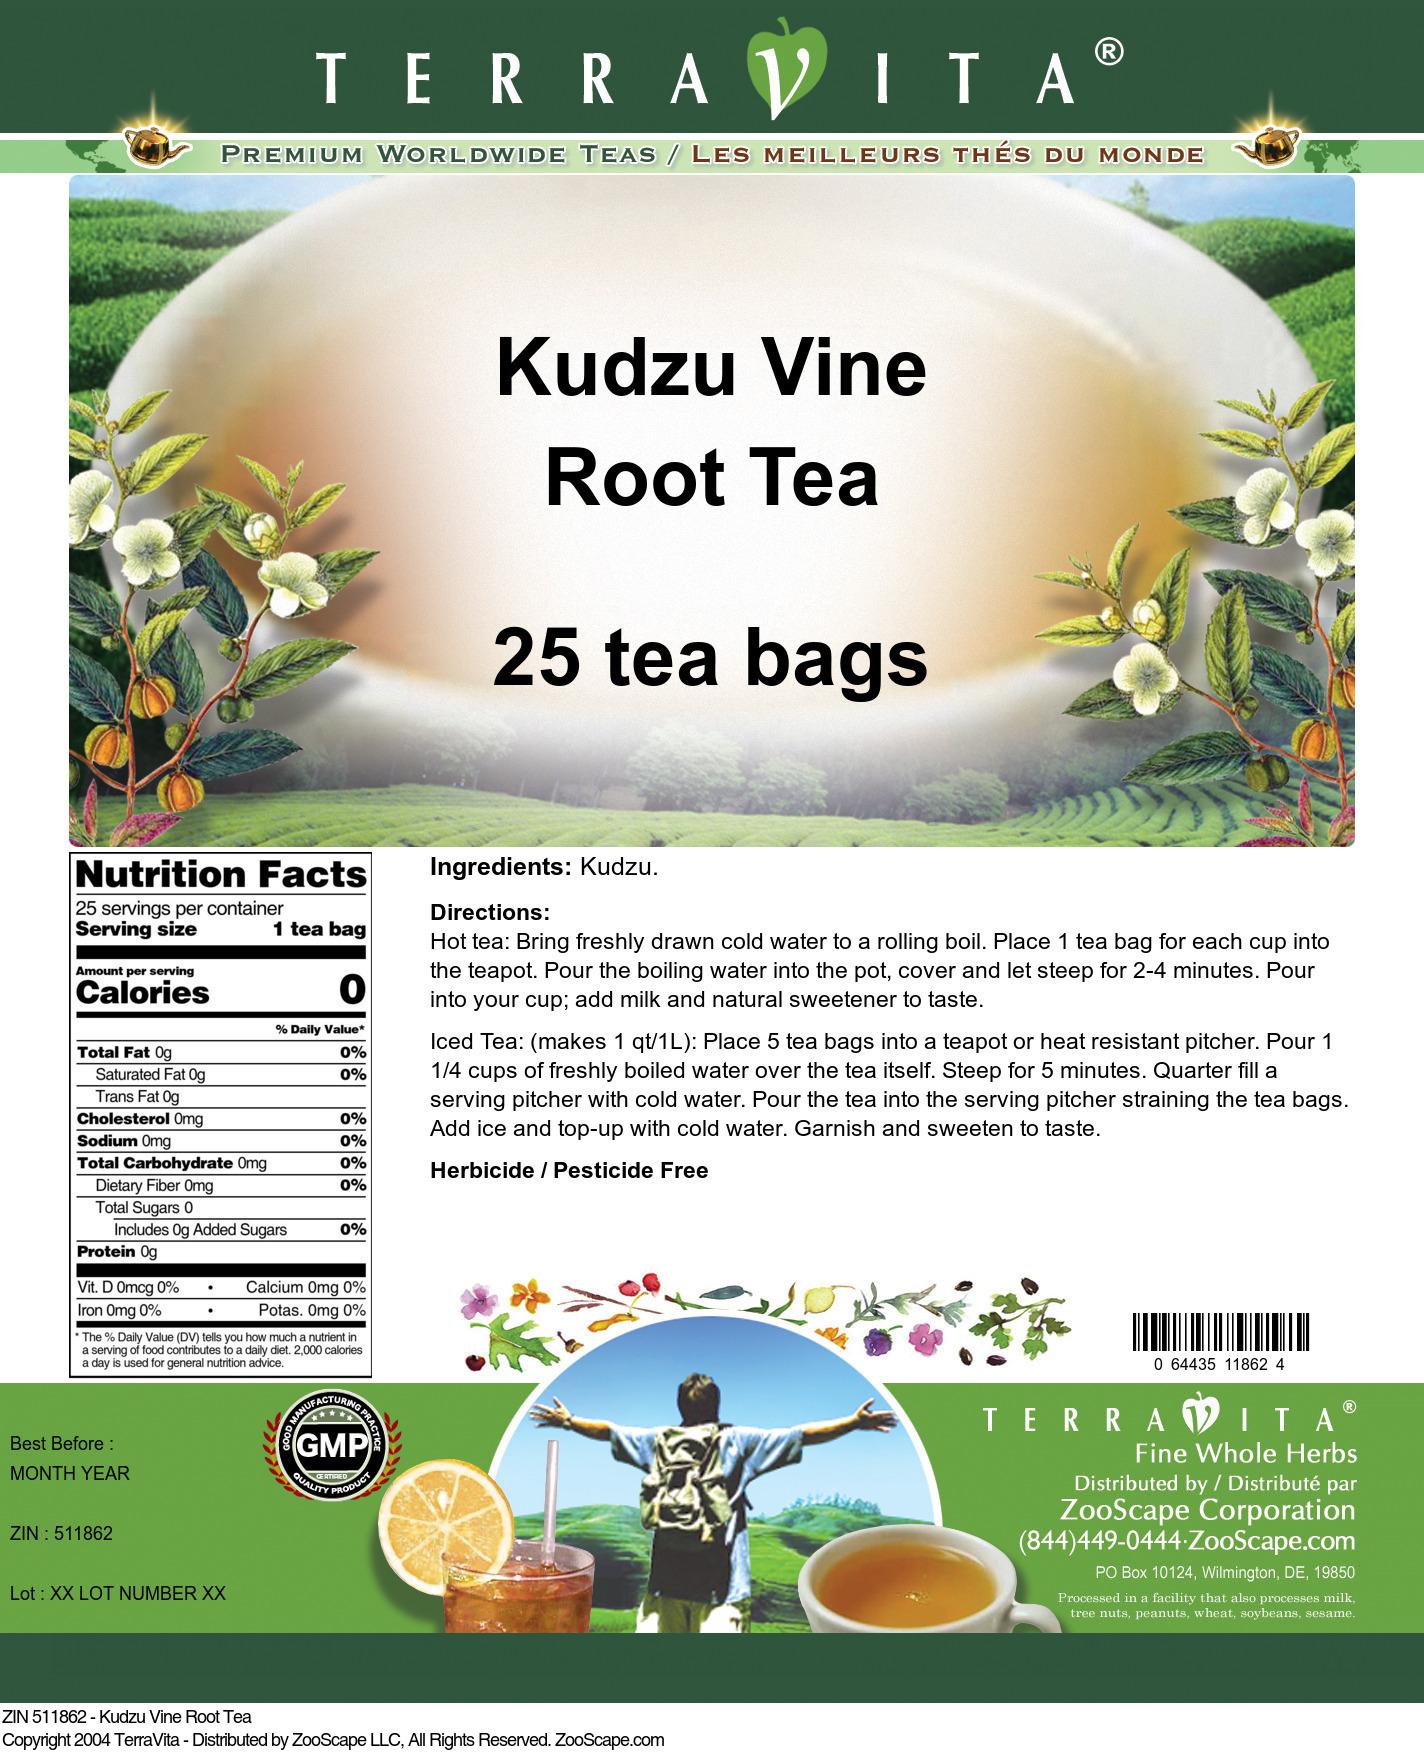 Kudzu Vine Root Tea